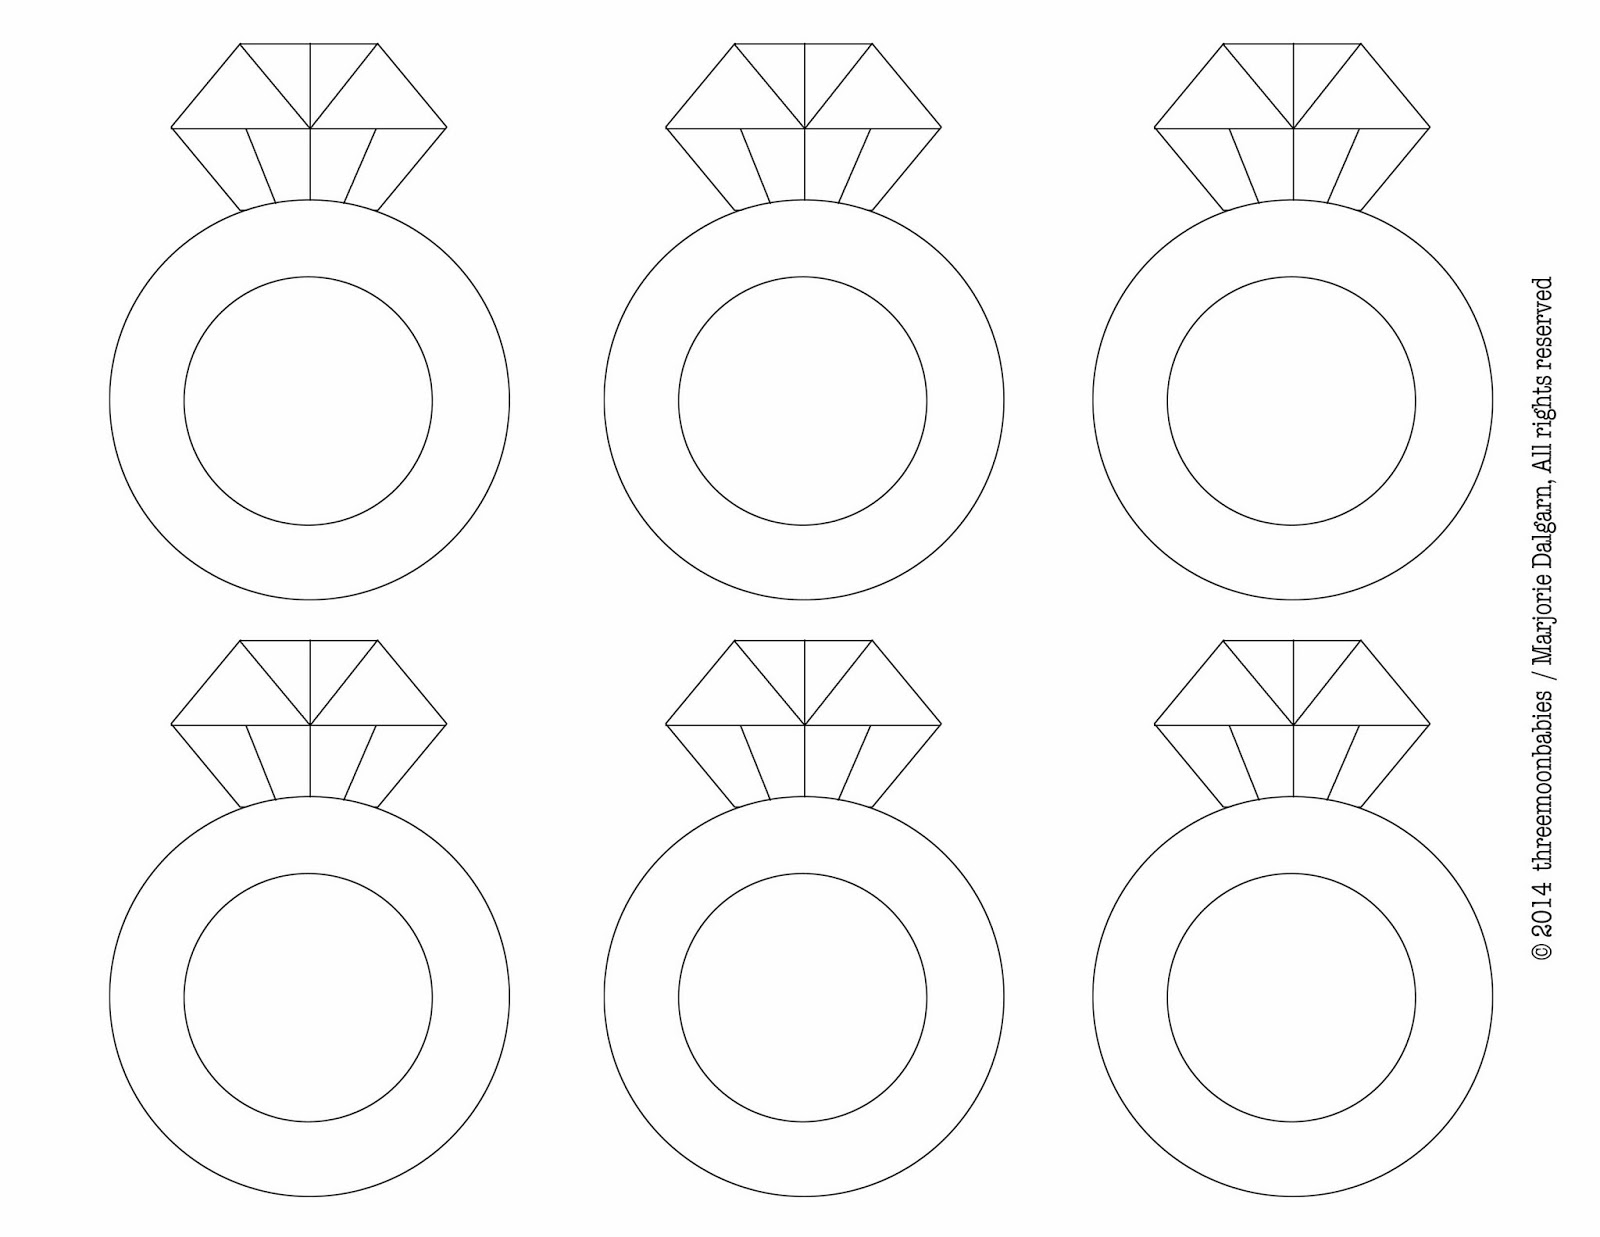 diamond-coloring-page-0001-q1